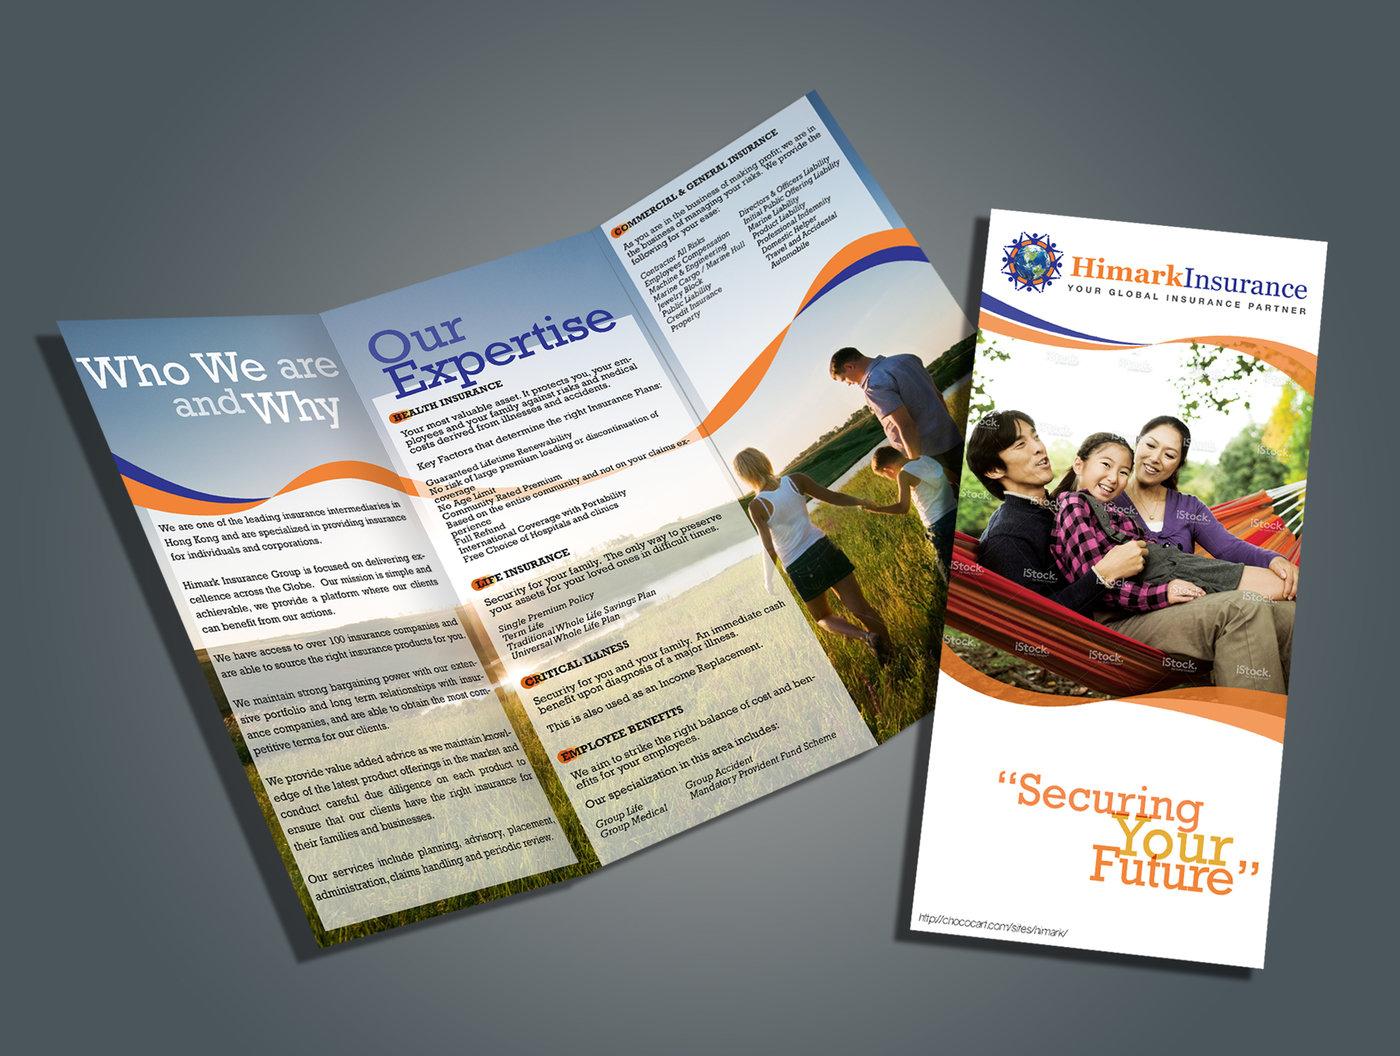 Brochure design himark insurance company by karina so at coroflot share altavistaventures Image collections